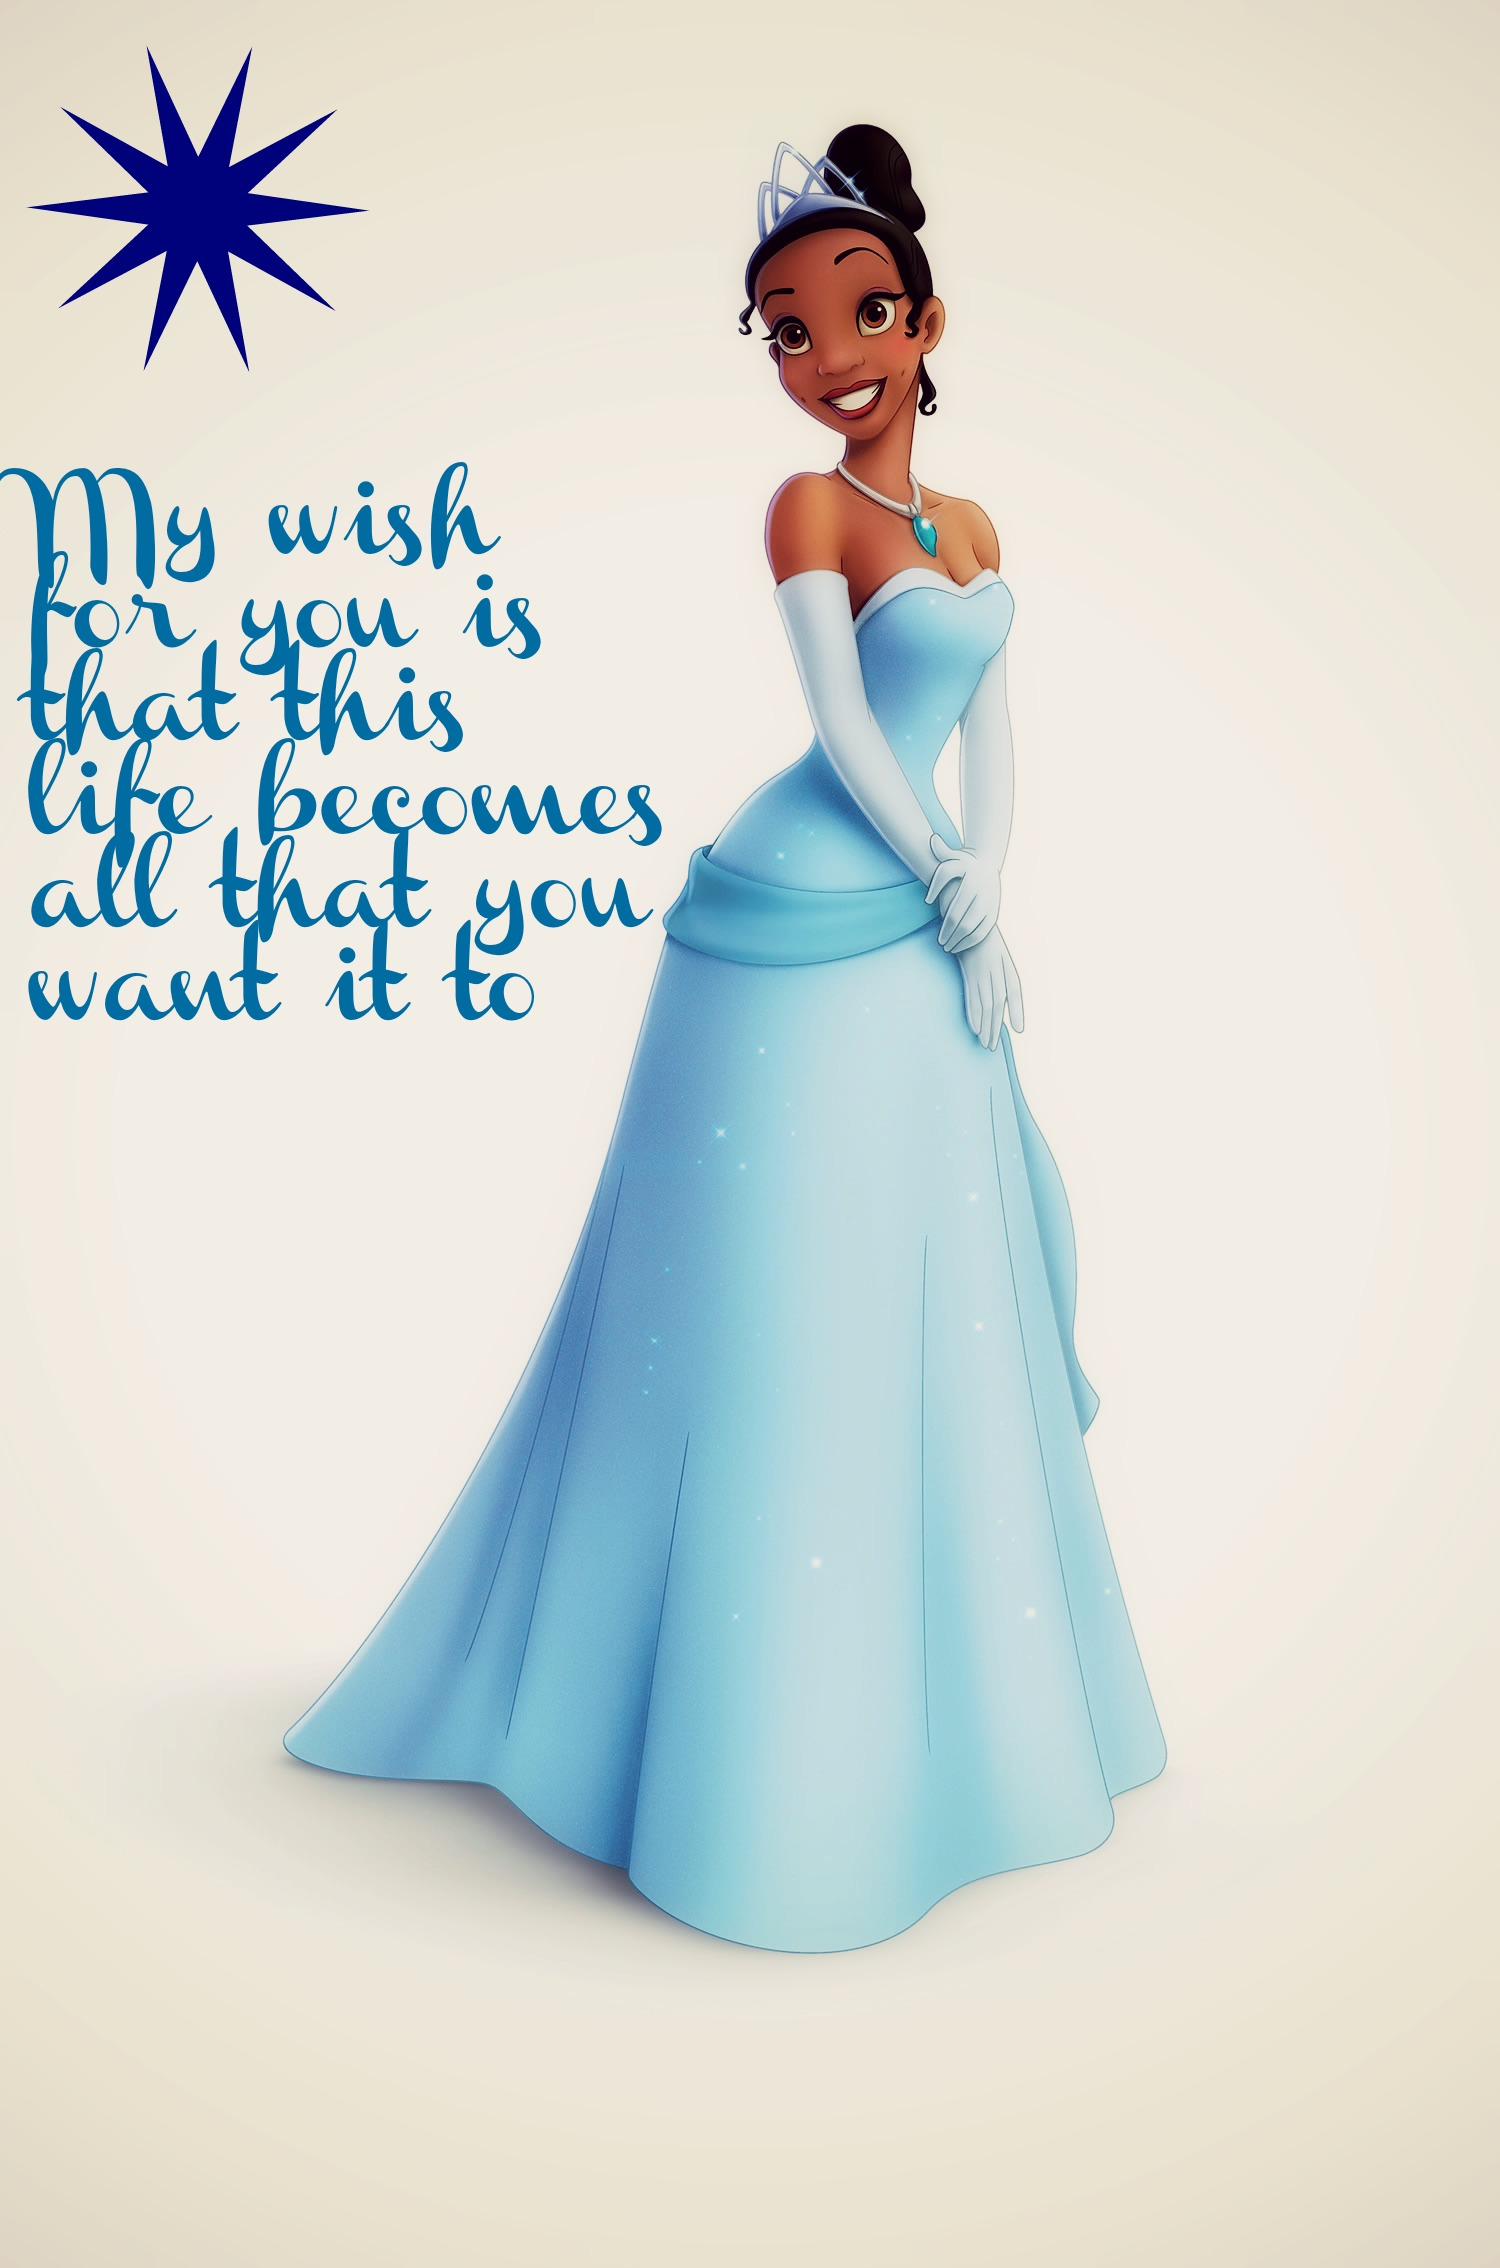 Tiana Disney-princess Fan